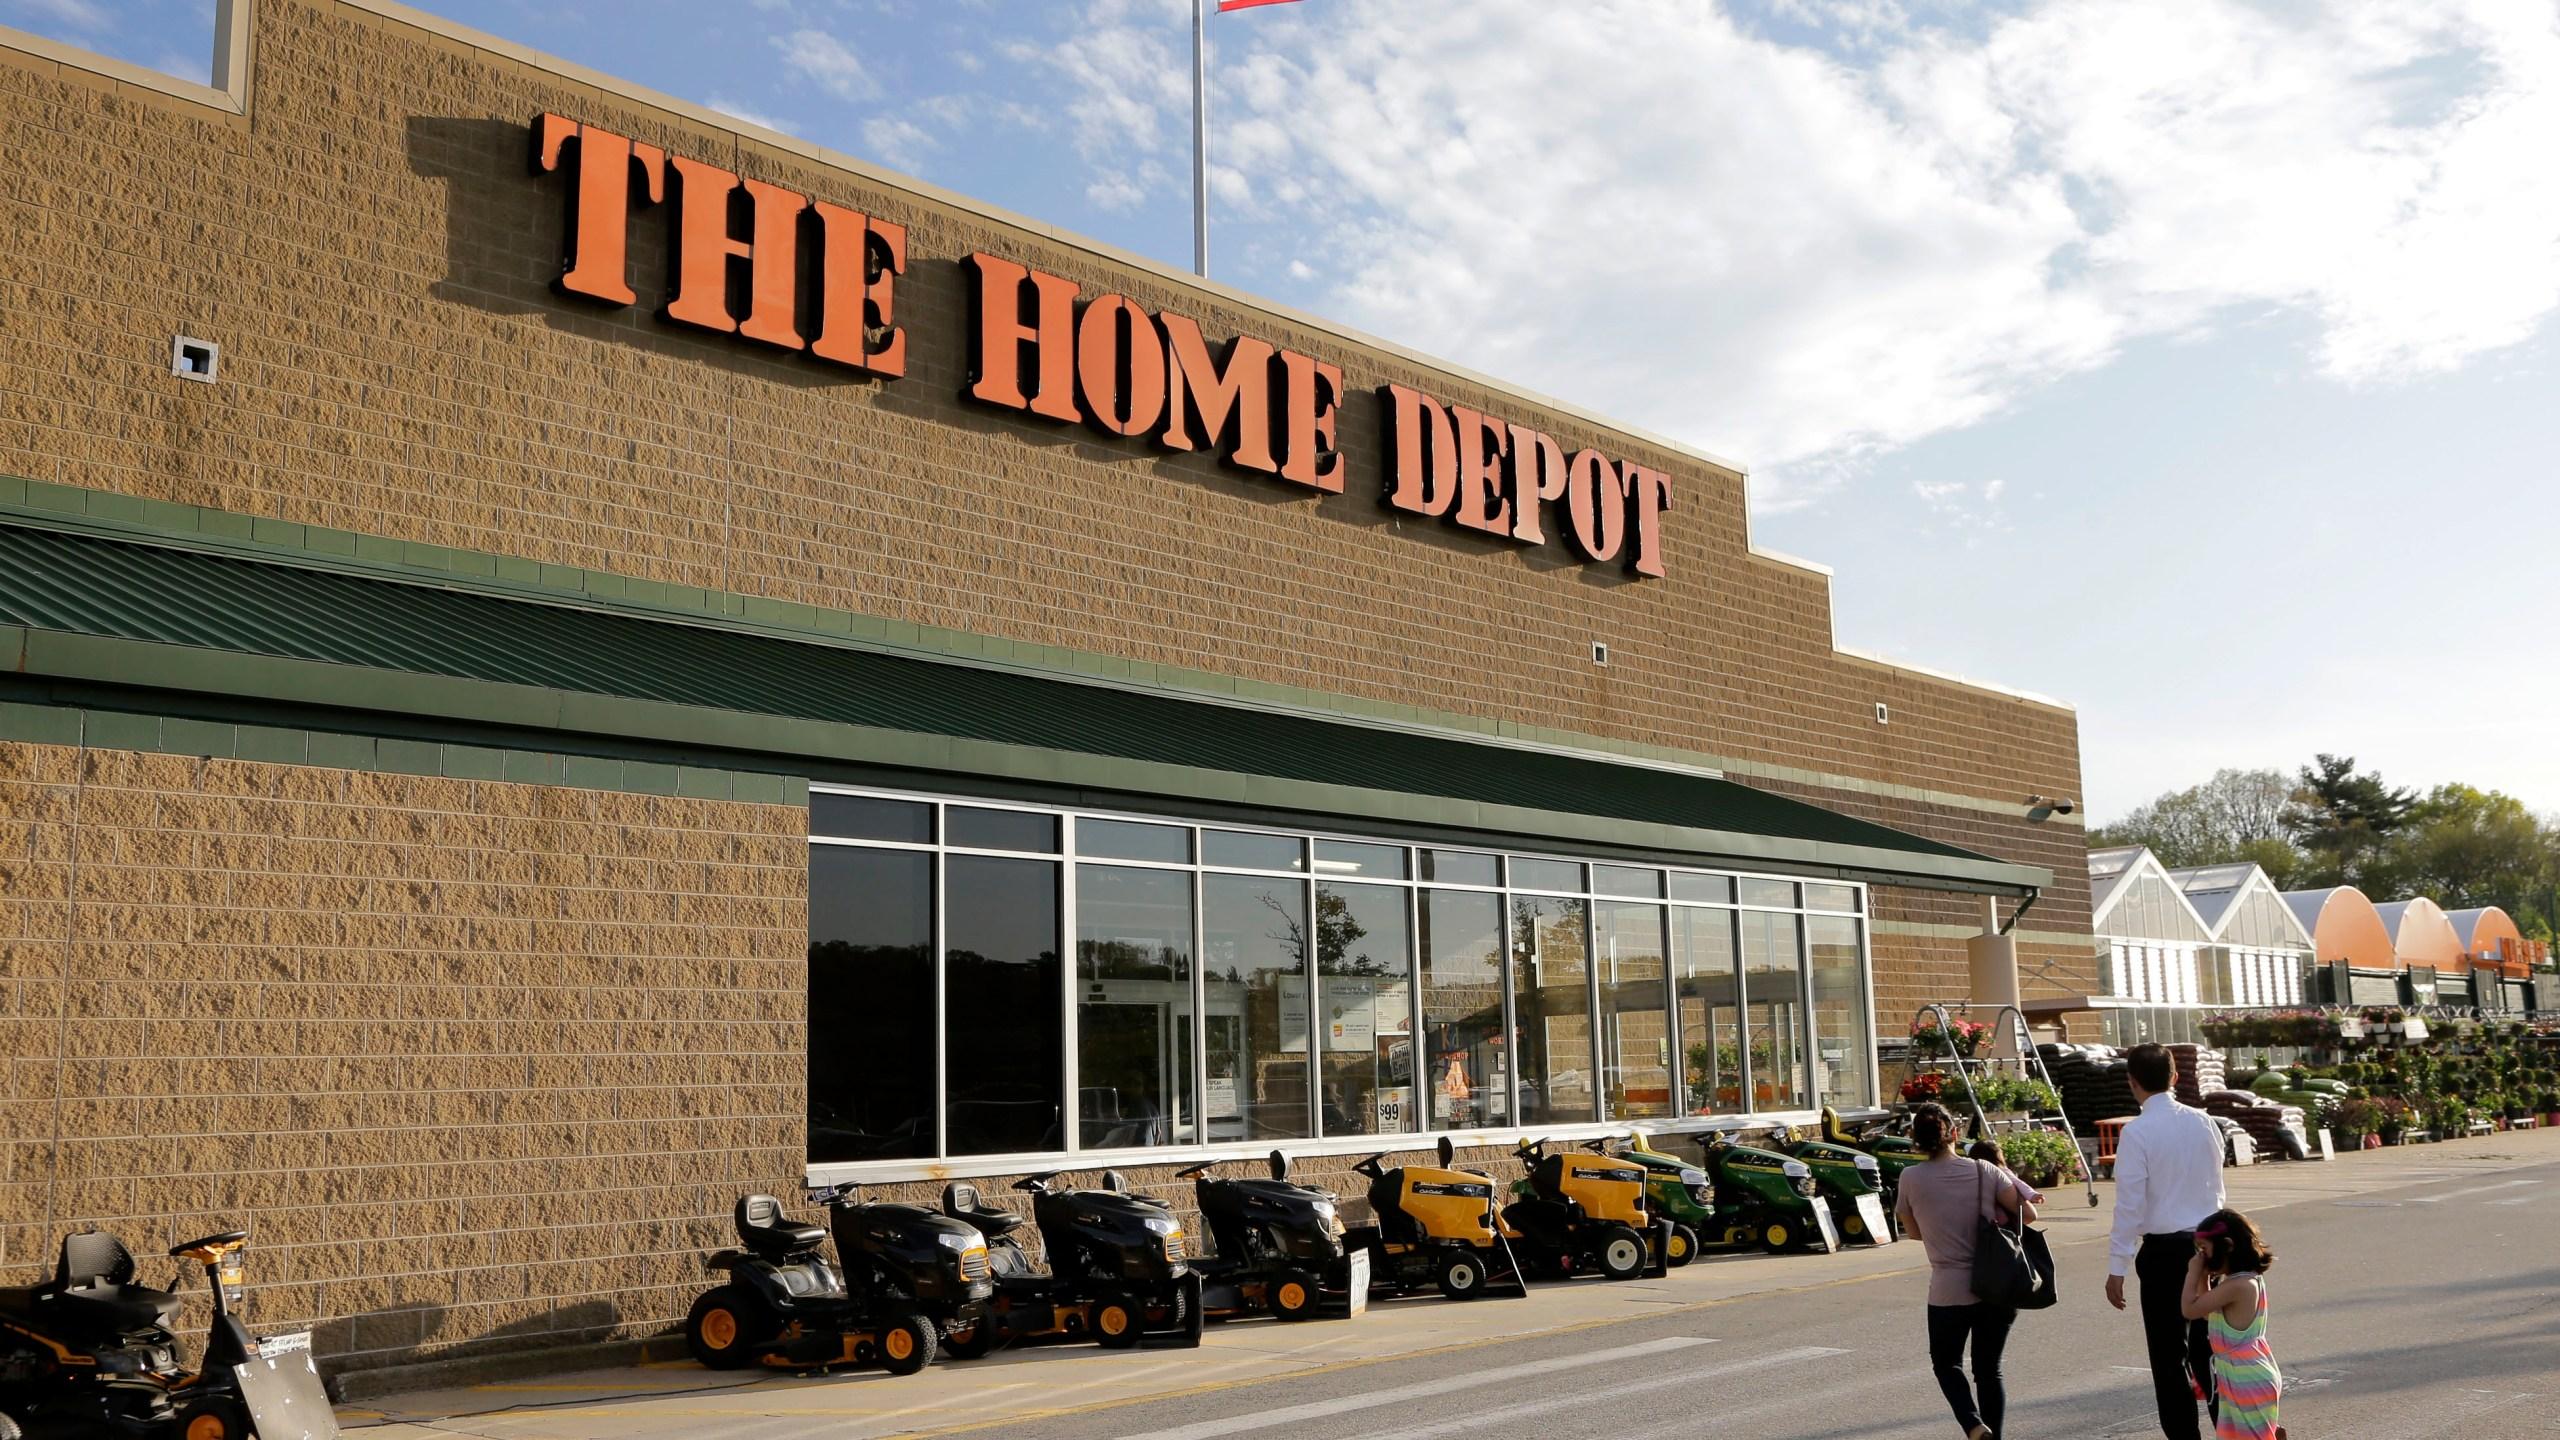 Home_Depot_Bonus_69962-159532.jpg80605152